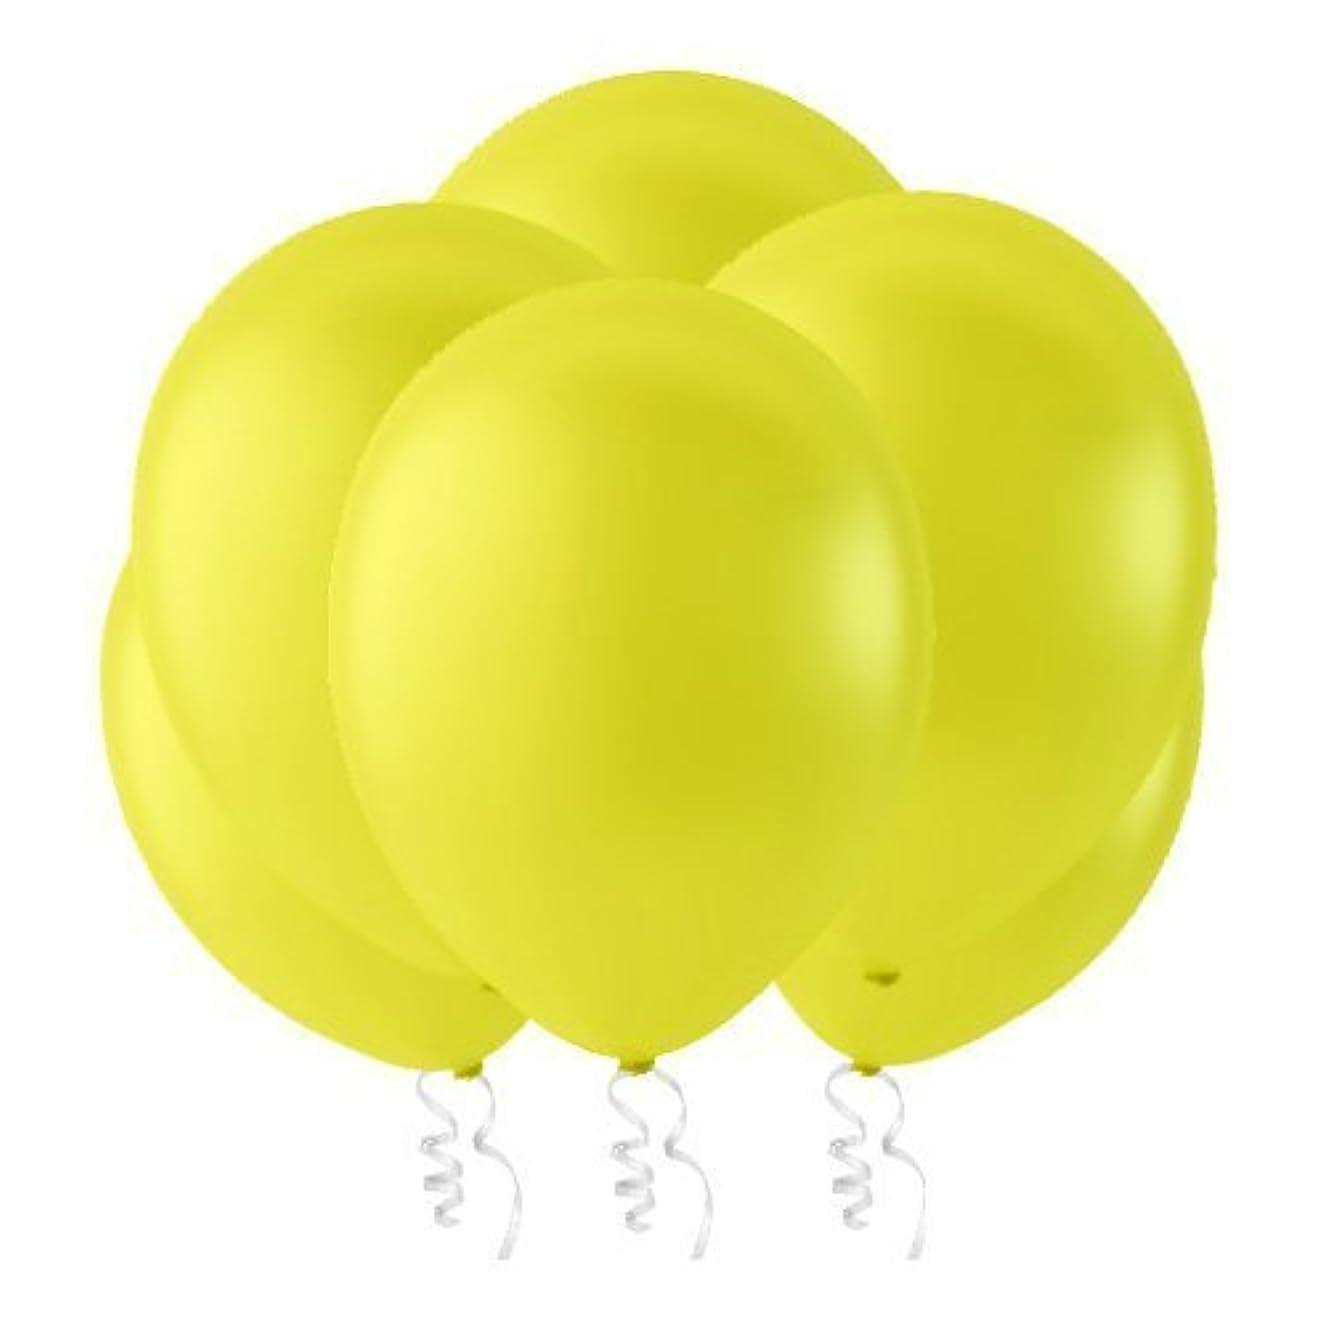 Creative Balloons Celebrity 9